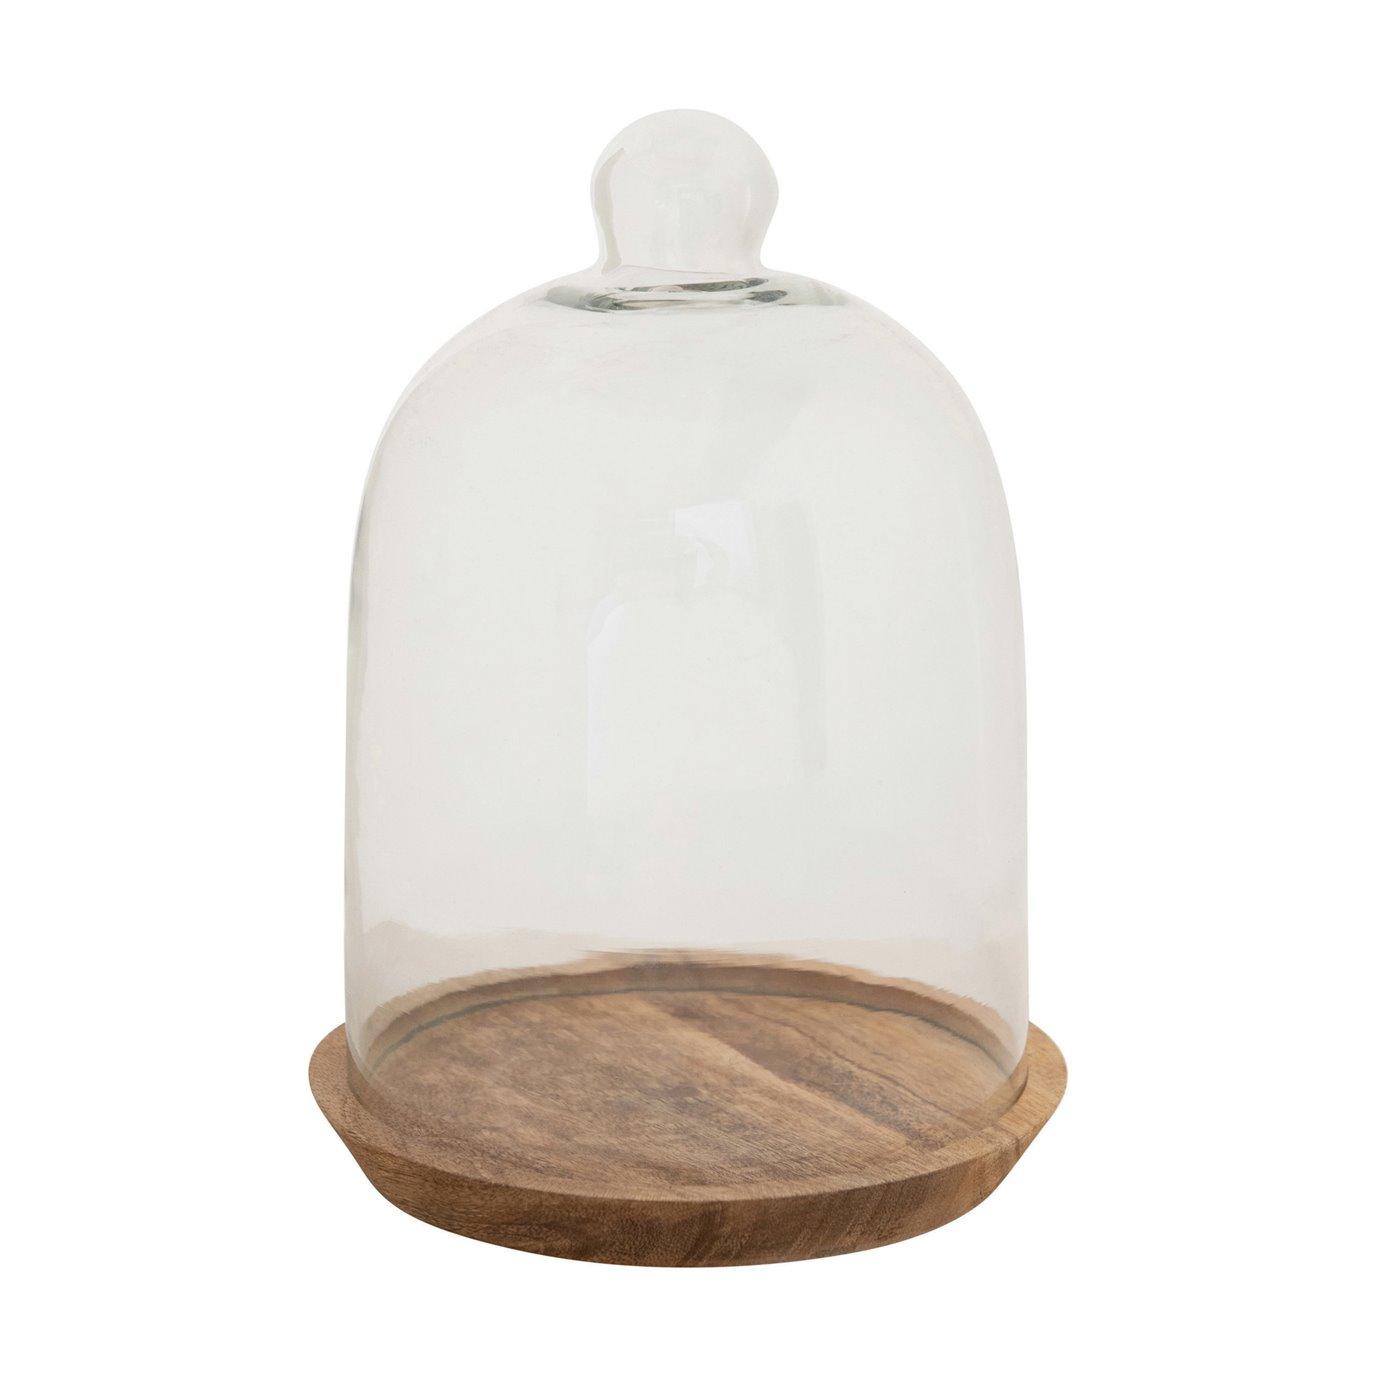 Glass Cloche with Mango Wood Base, Set of 2